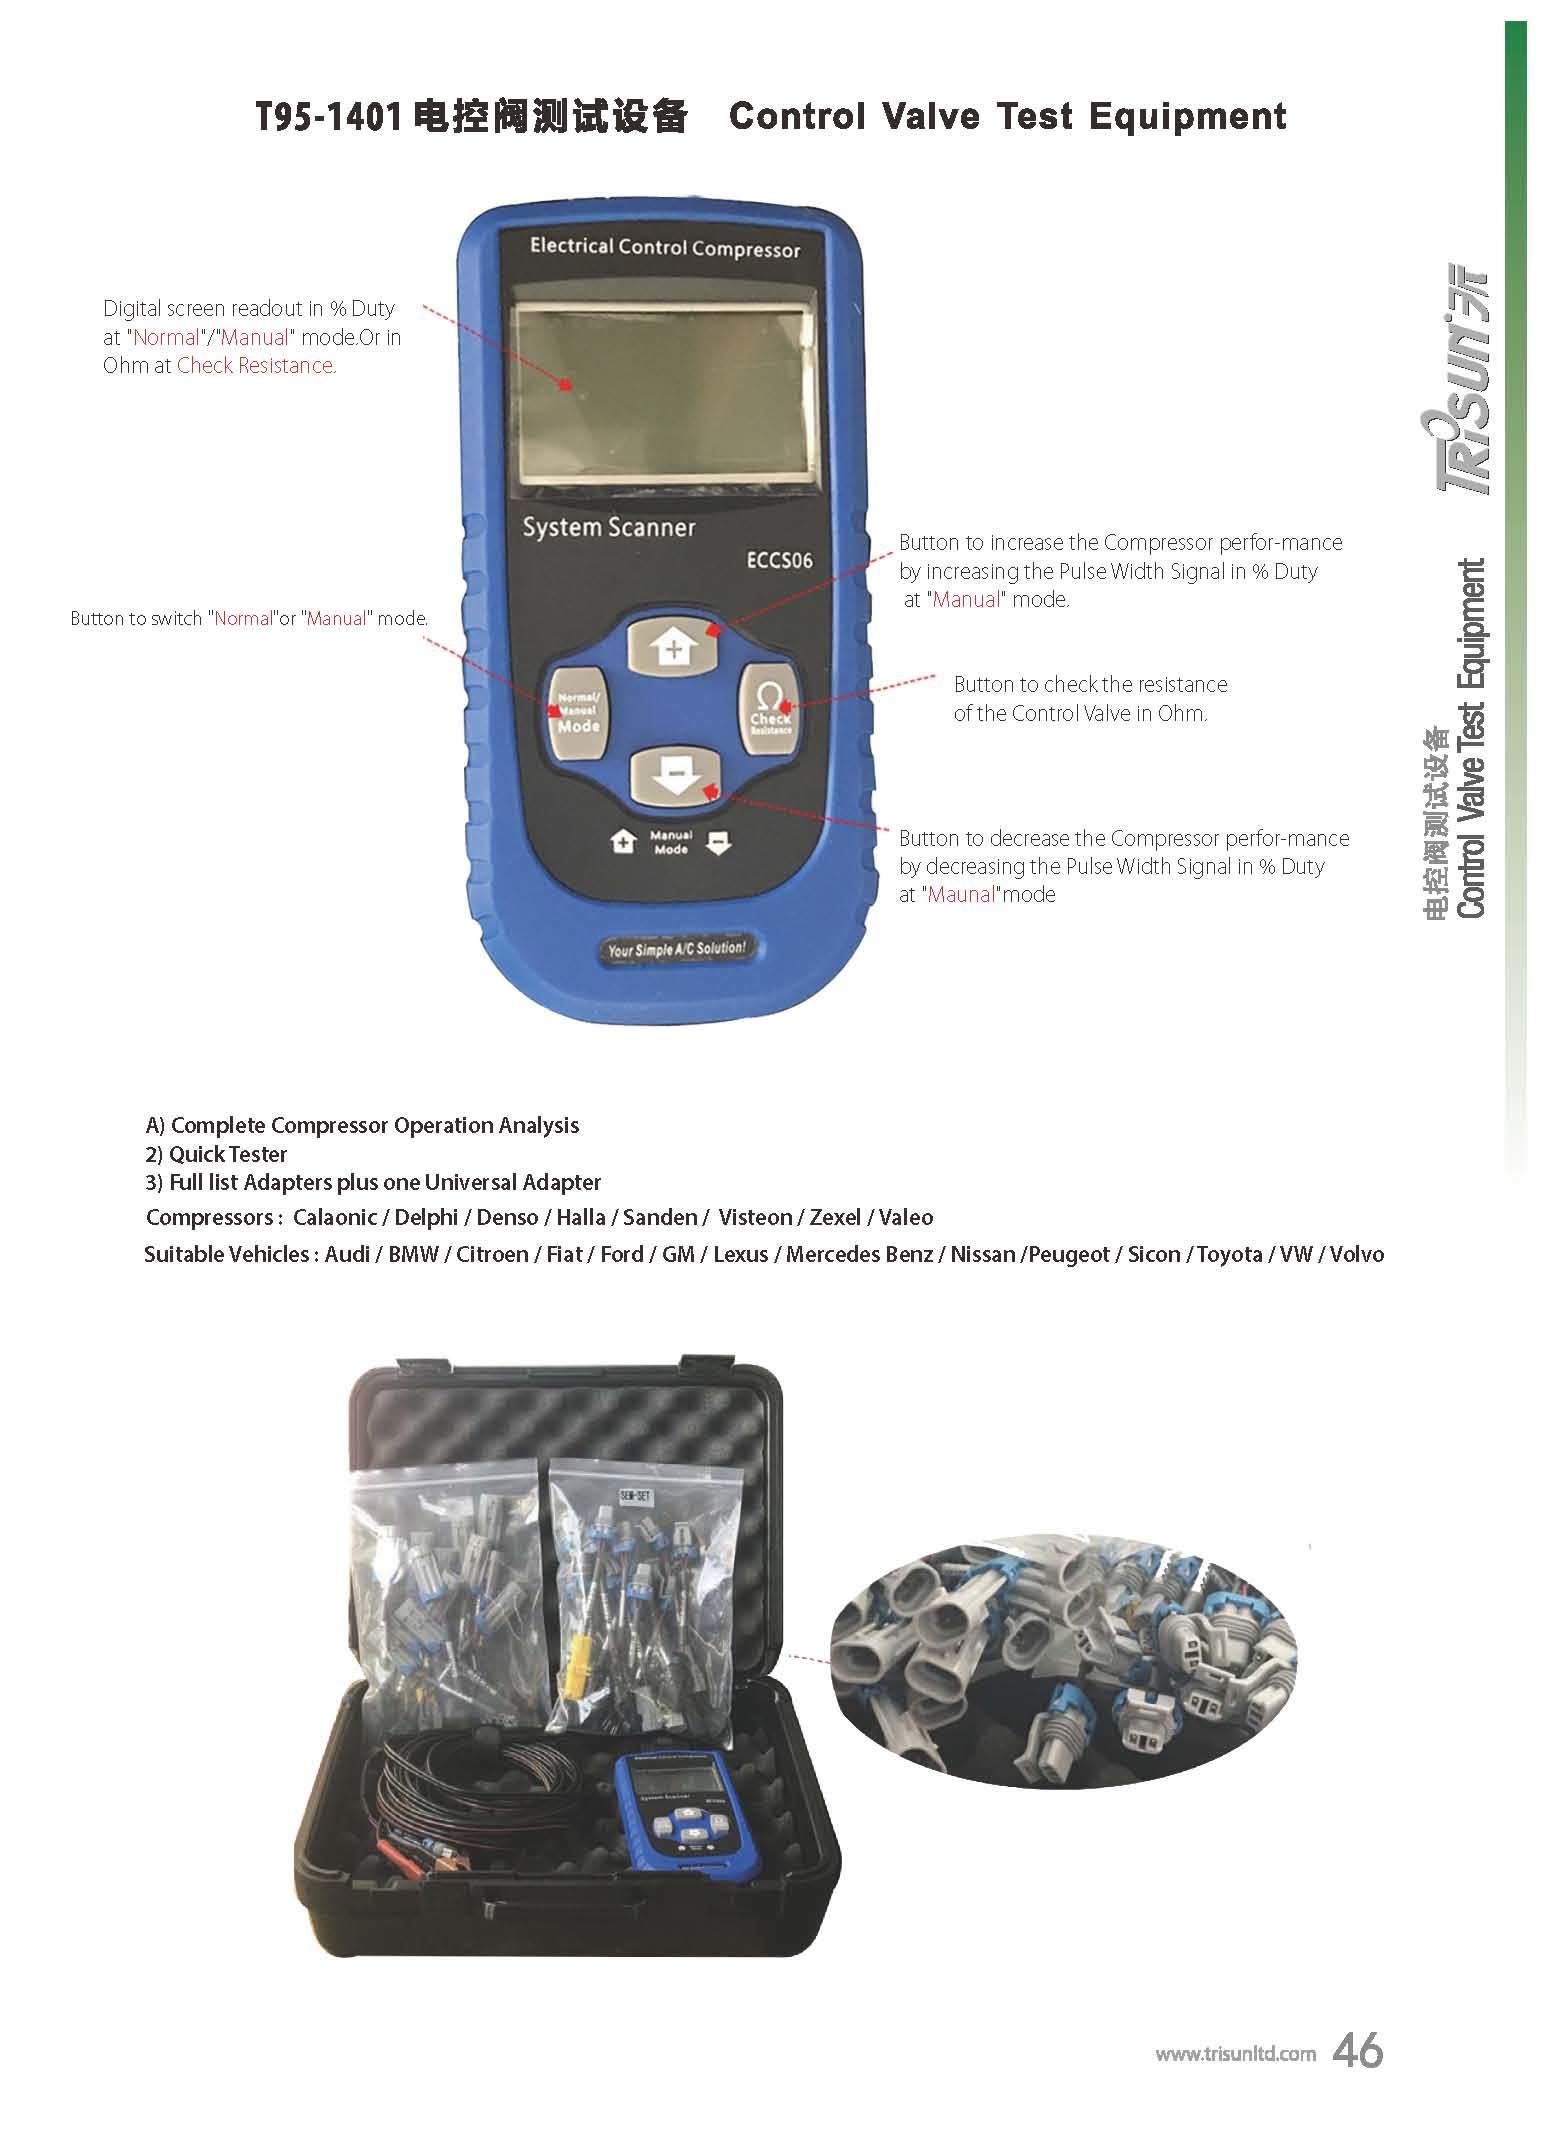 2015 Bmw X5 Ac Manual Ebook Mini Audio Analysts Using 4017 Array Rh Zettadata